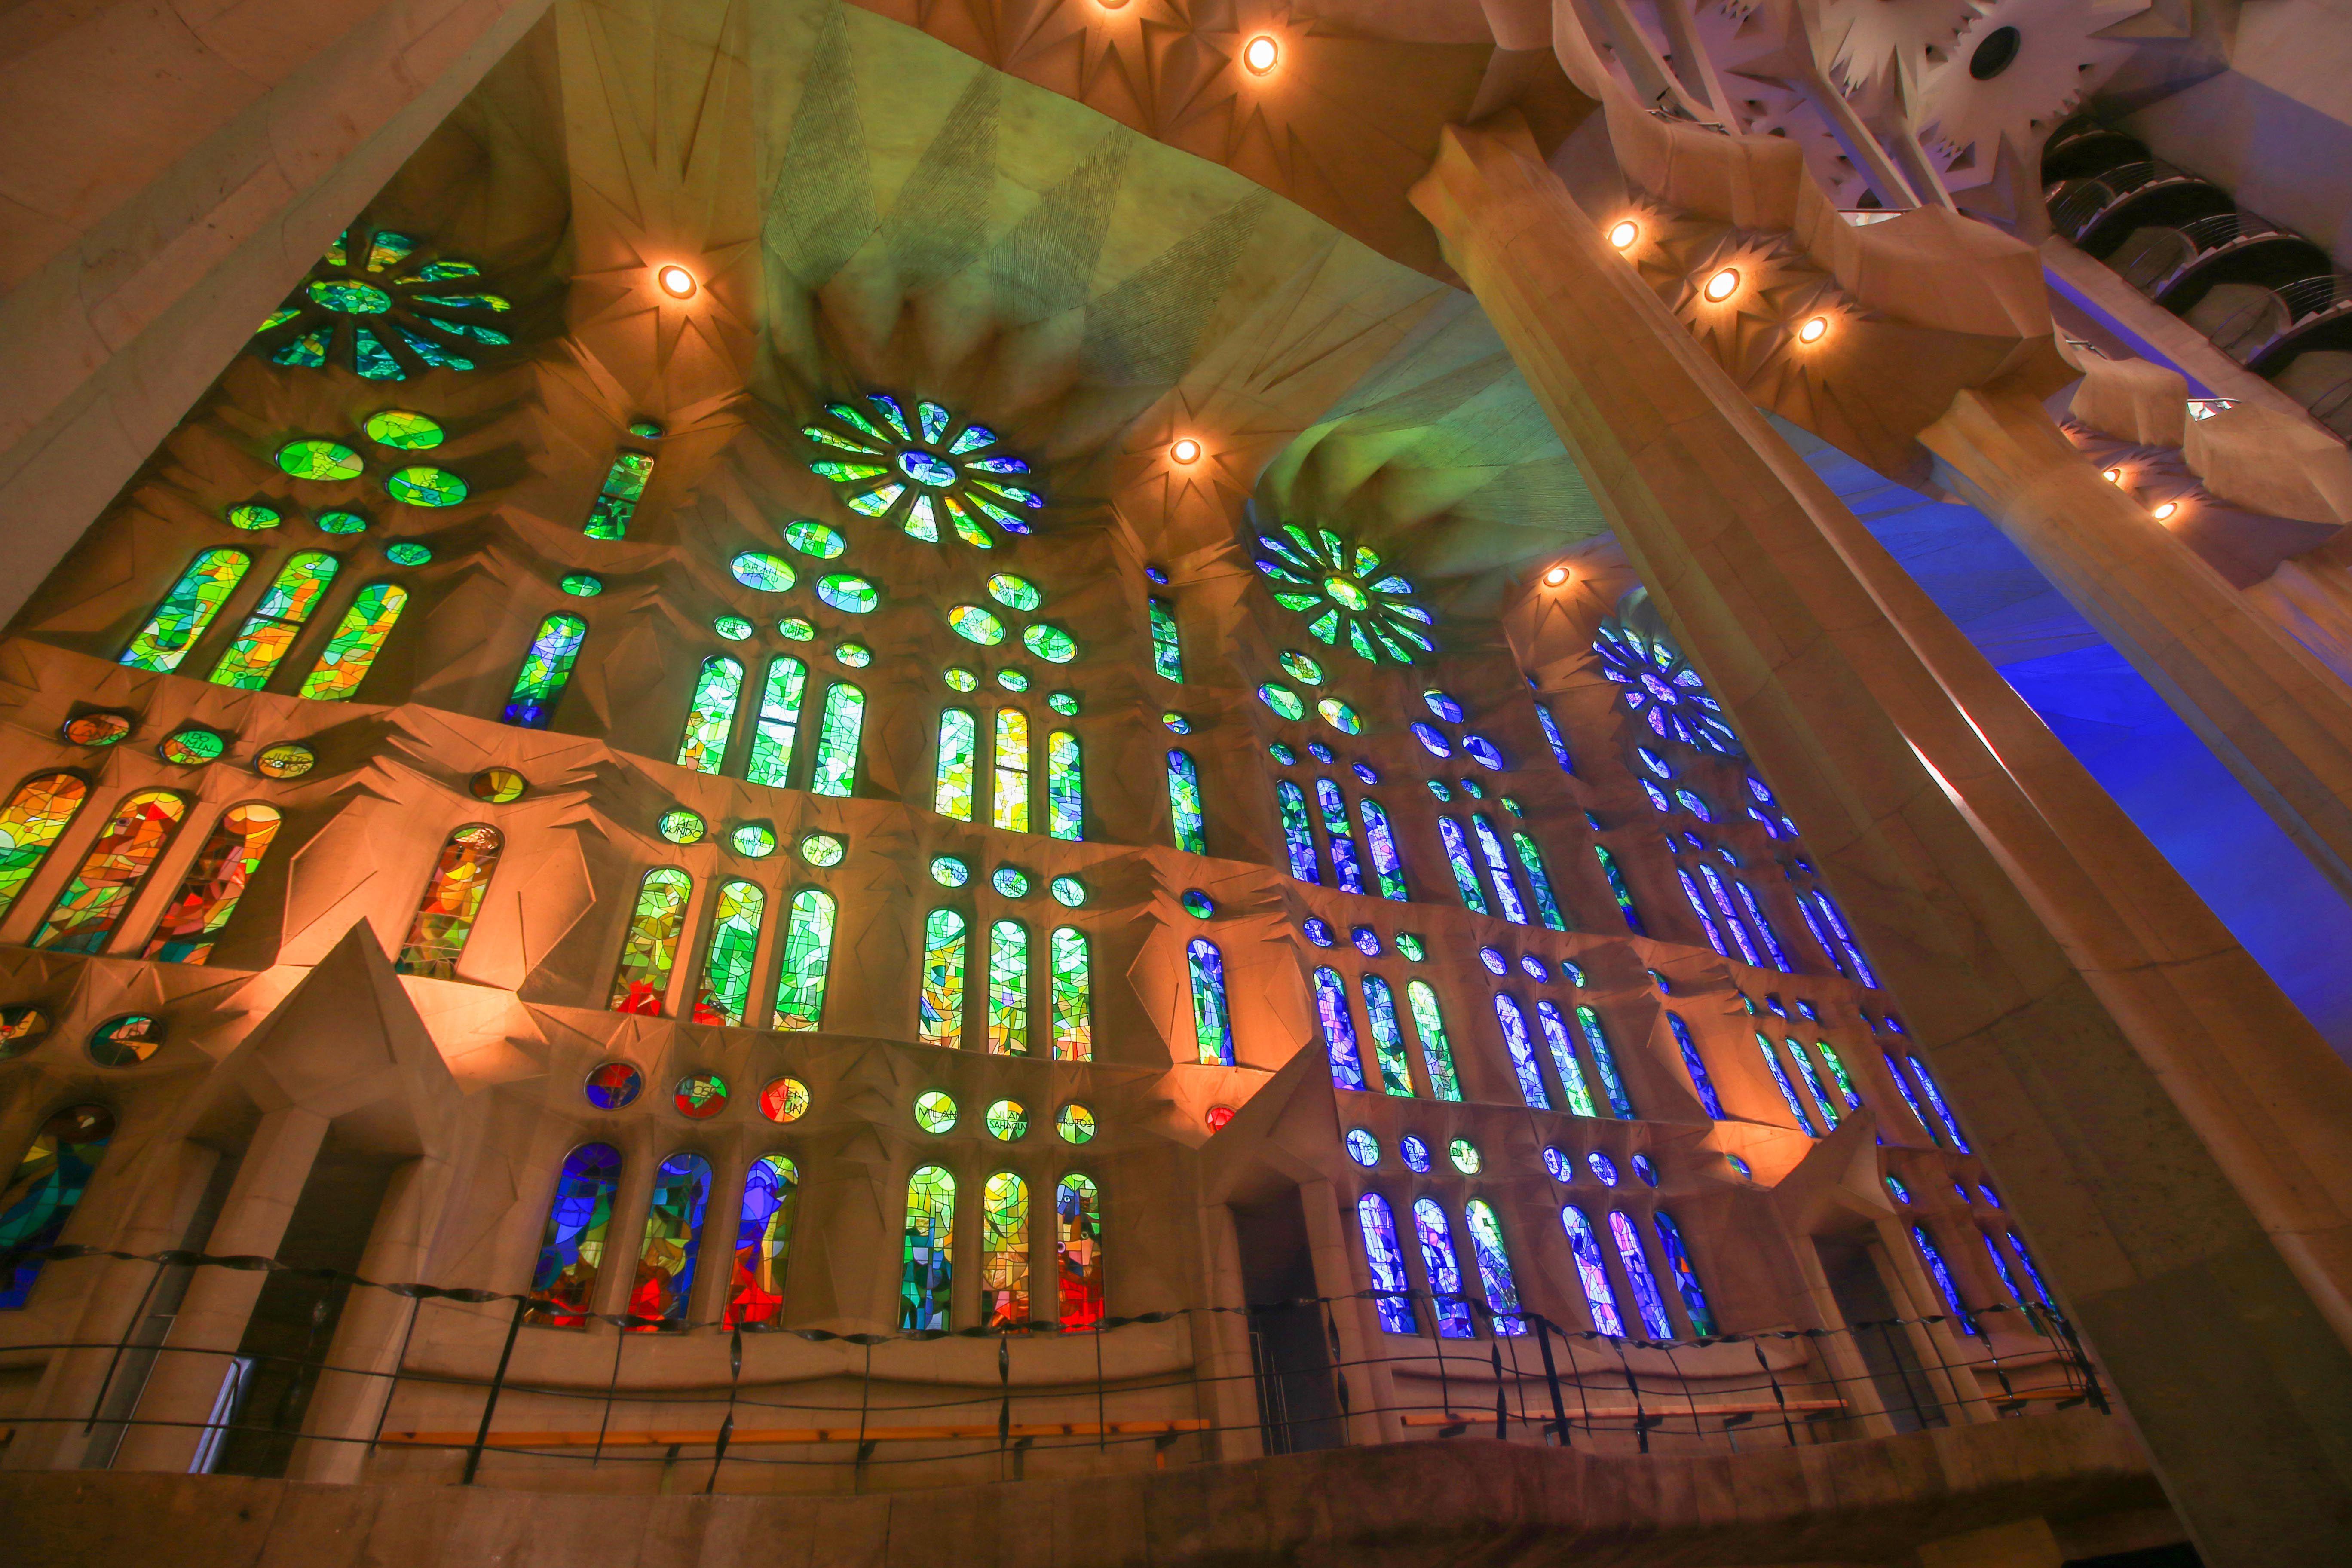 Stained Glass windows inside La Sagrada Familia